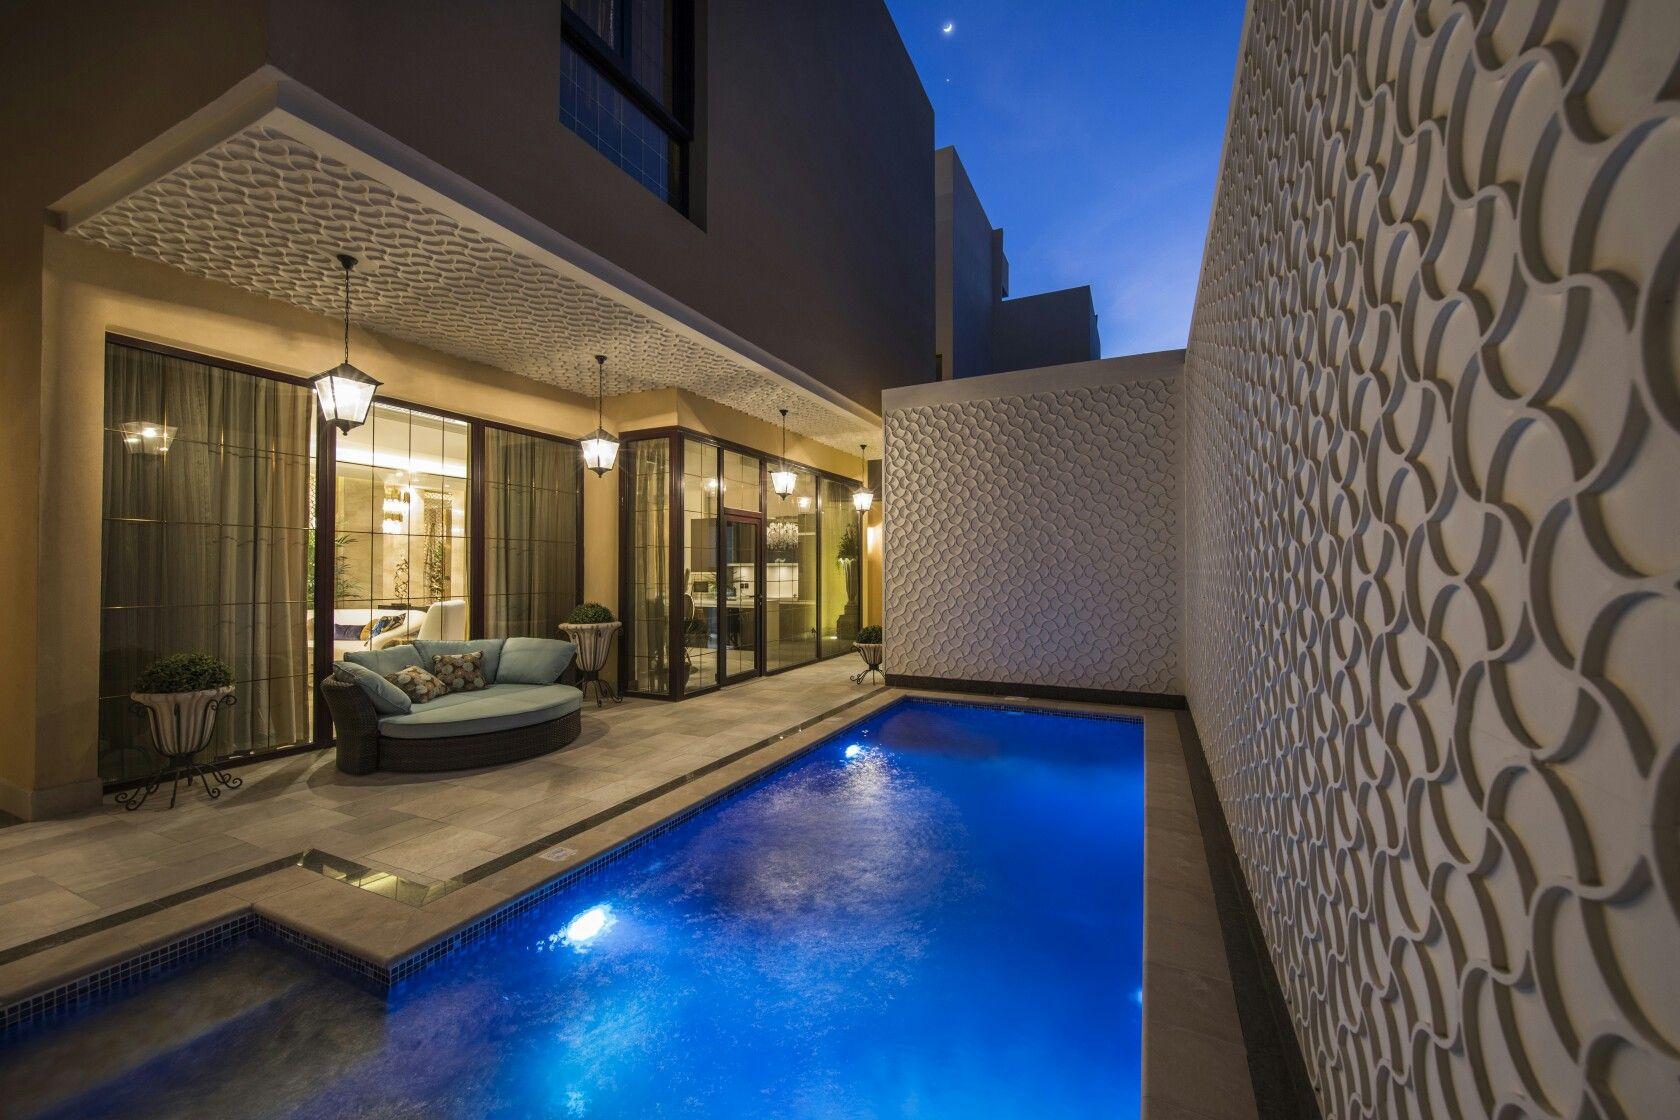 Pin By Alareen Architect On حياة لانتانا نموذج الفيلا E House Front Design House Styles House Front